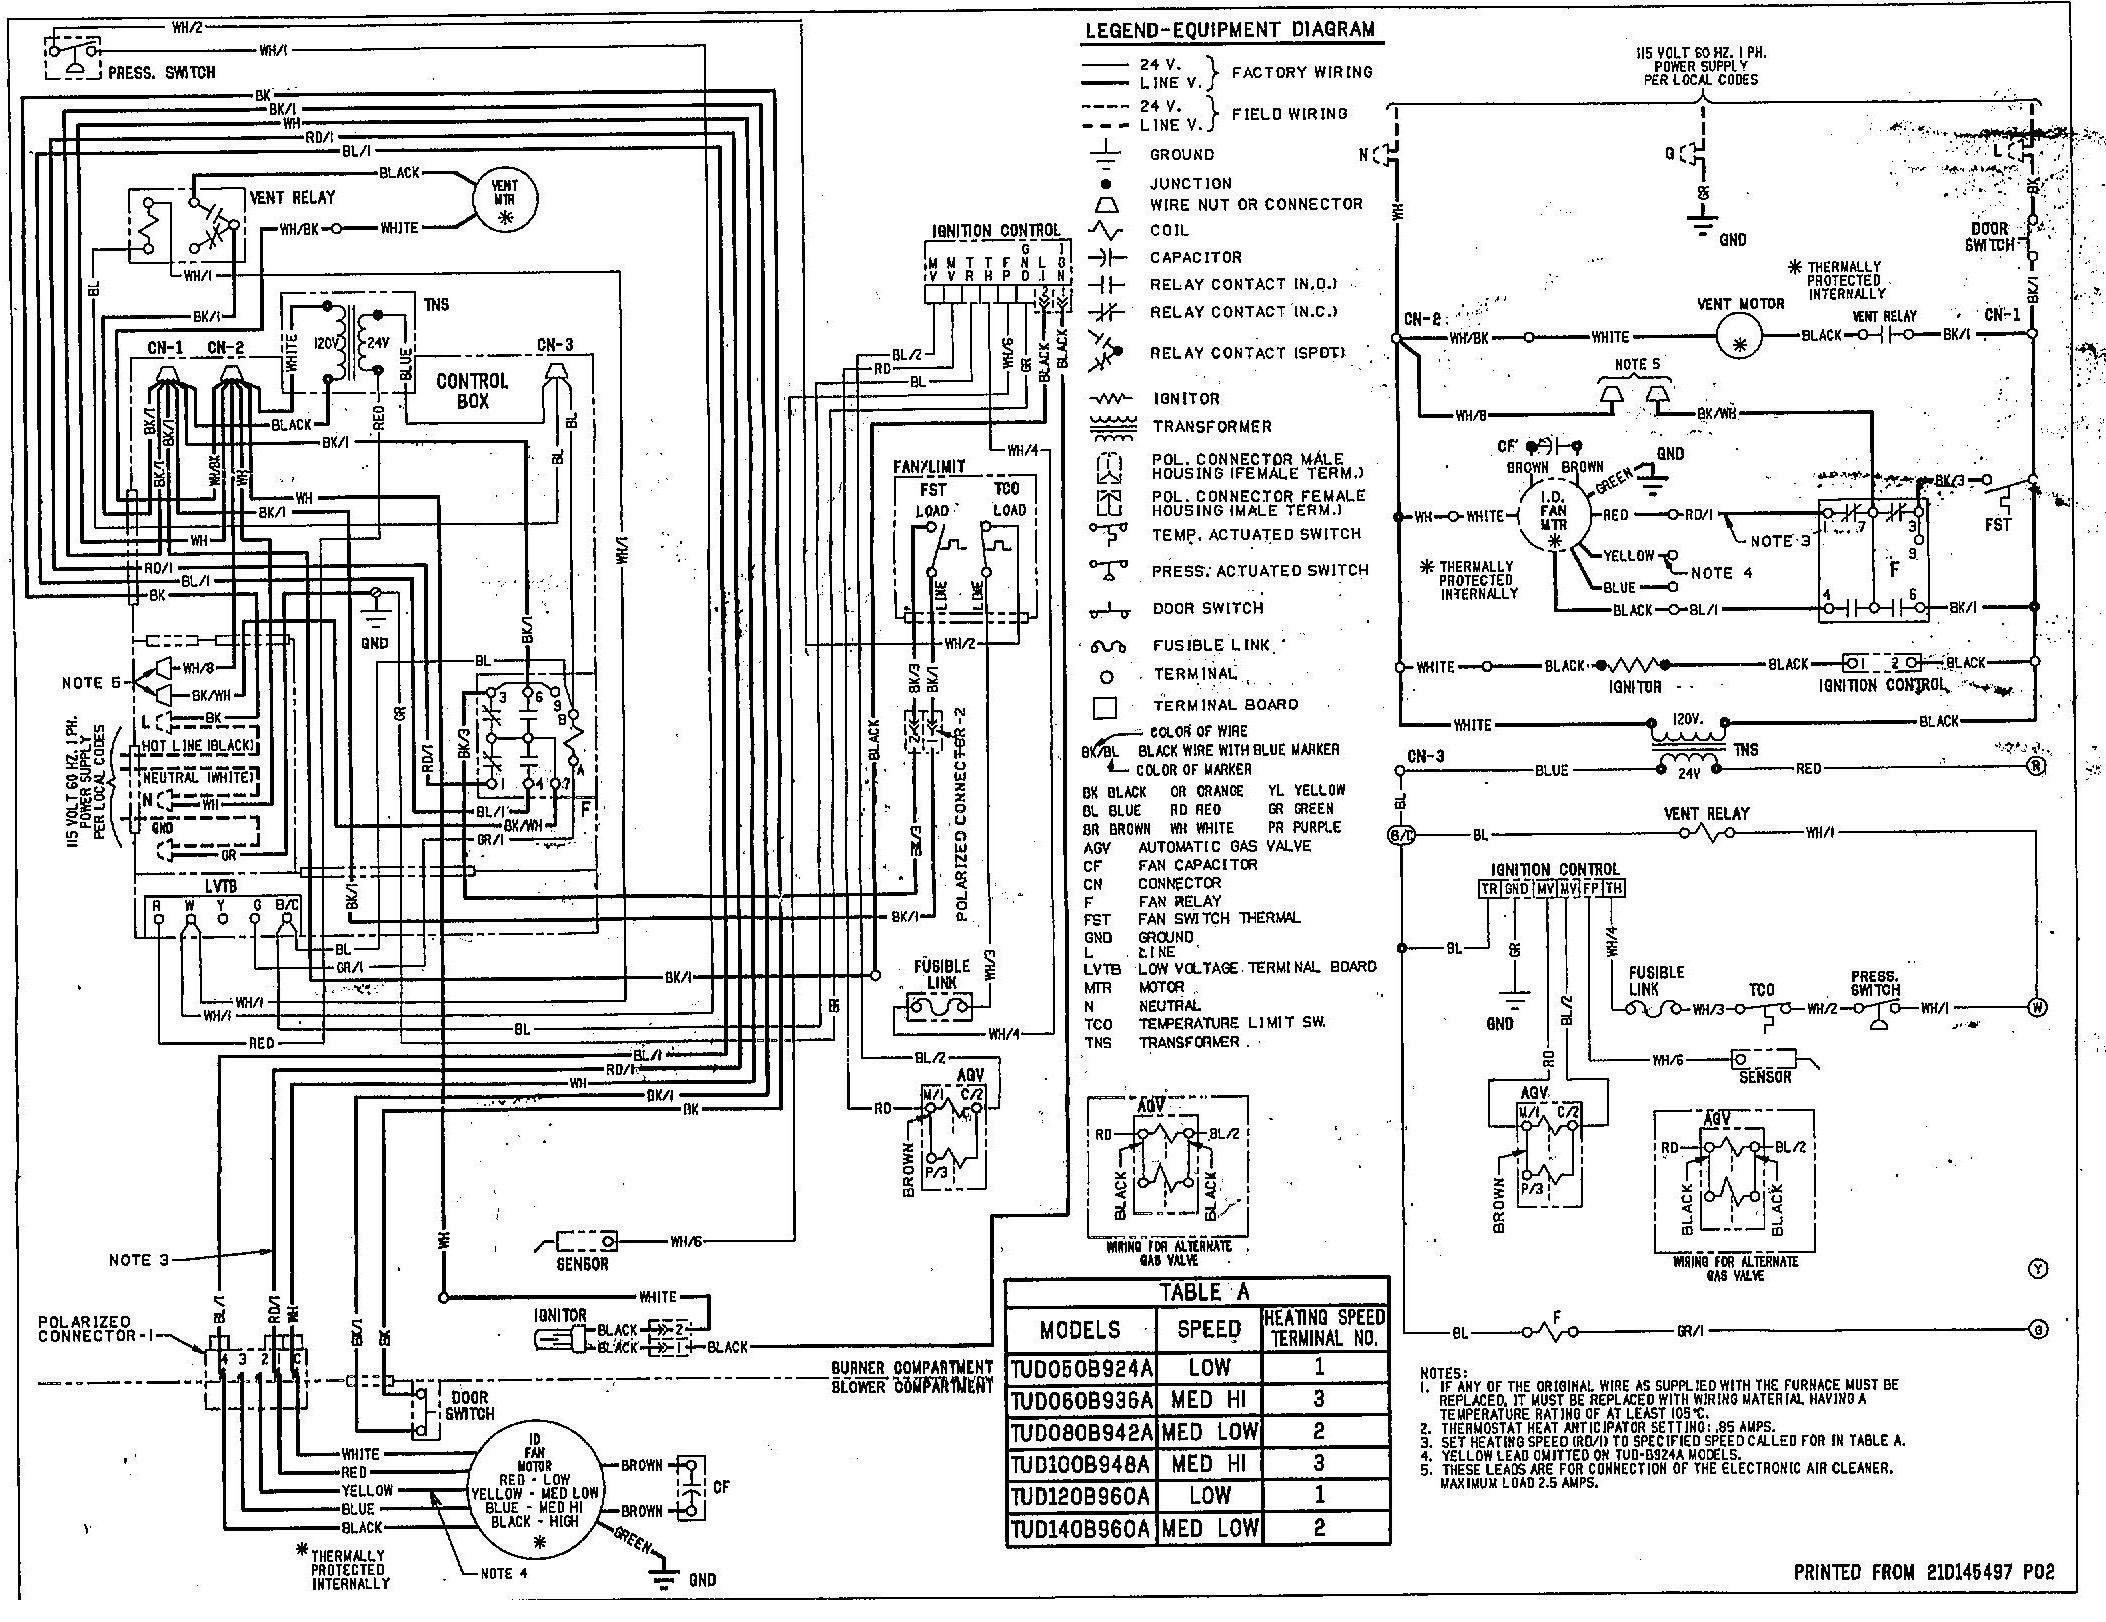 trane unit heater wiring diagram Collection-Trane Wiring Diagram 8-j